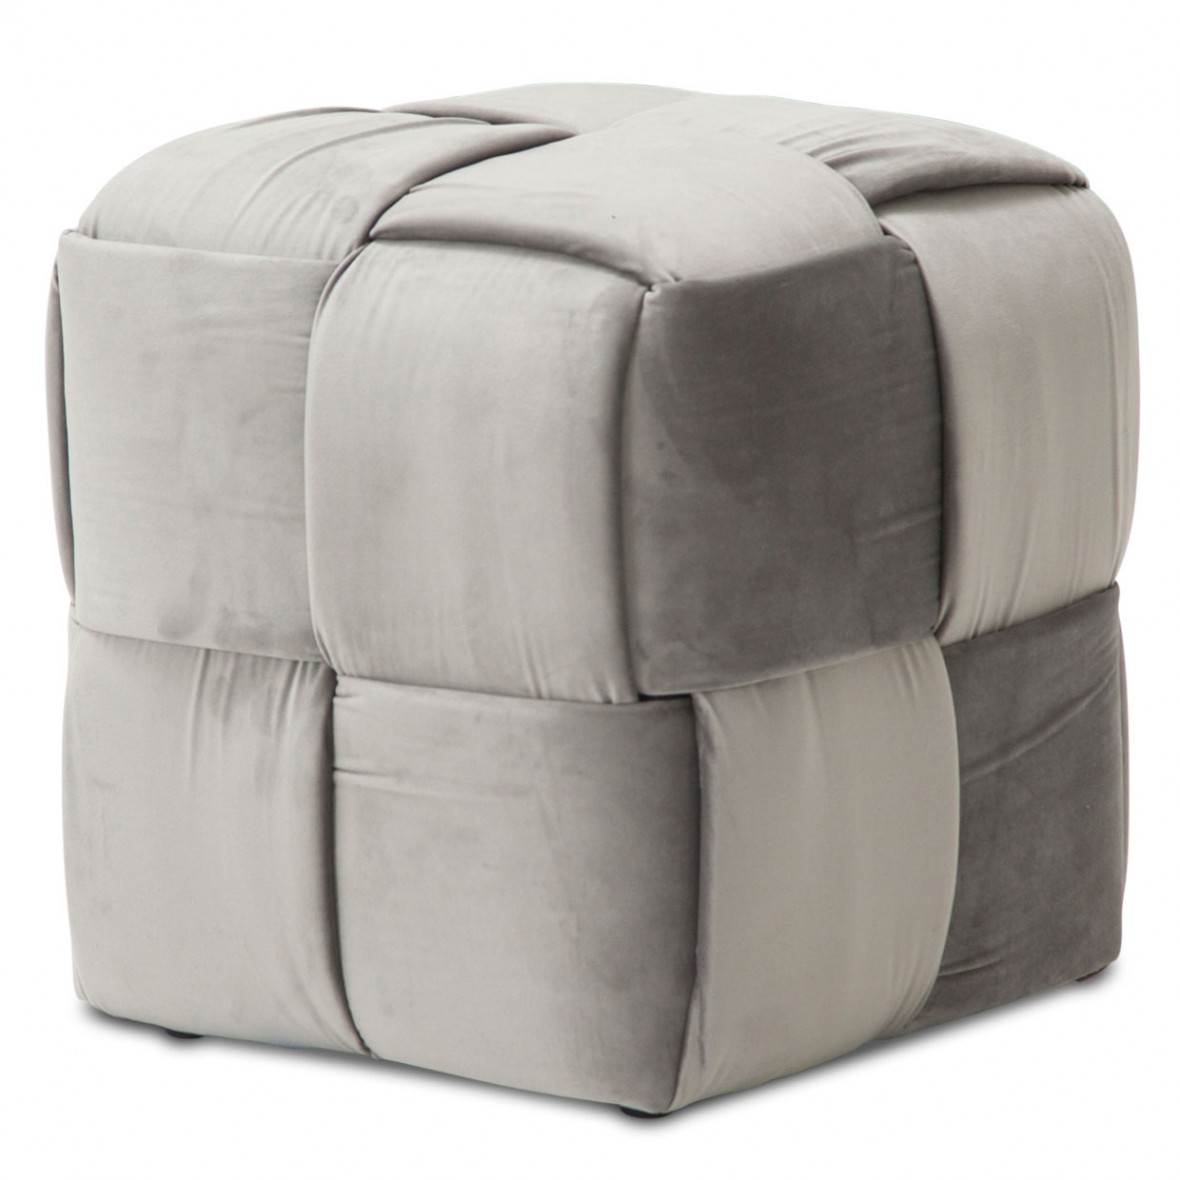 Пуф декоративный плетеный кубик